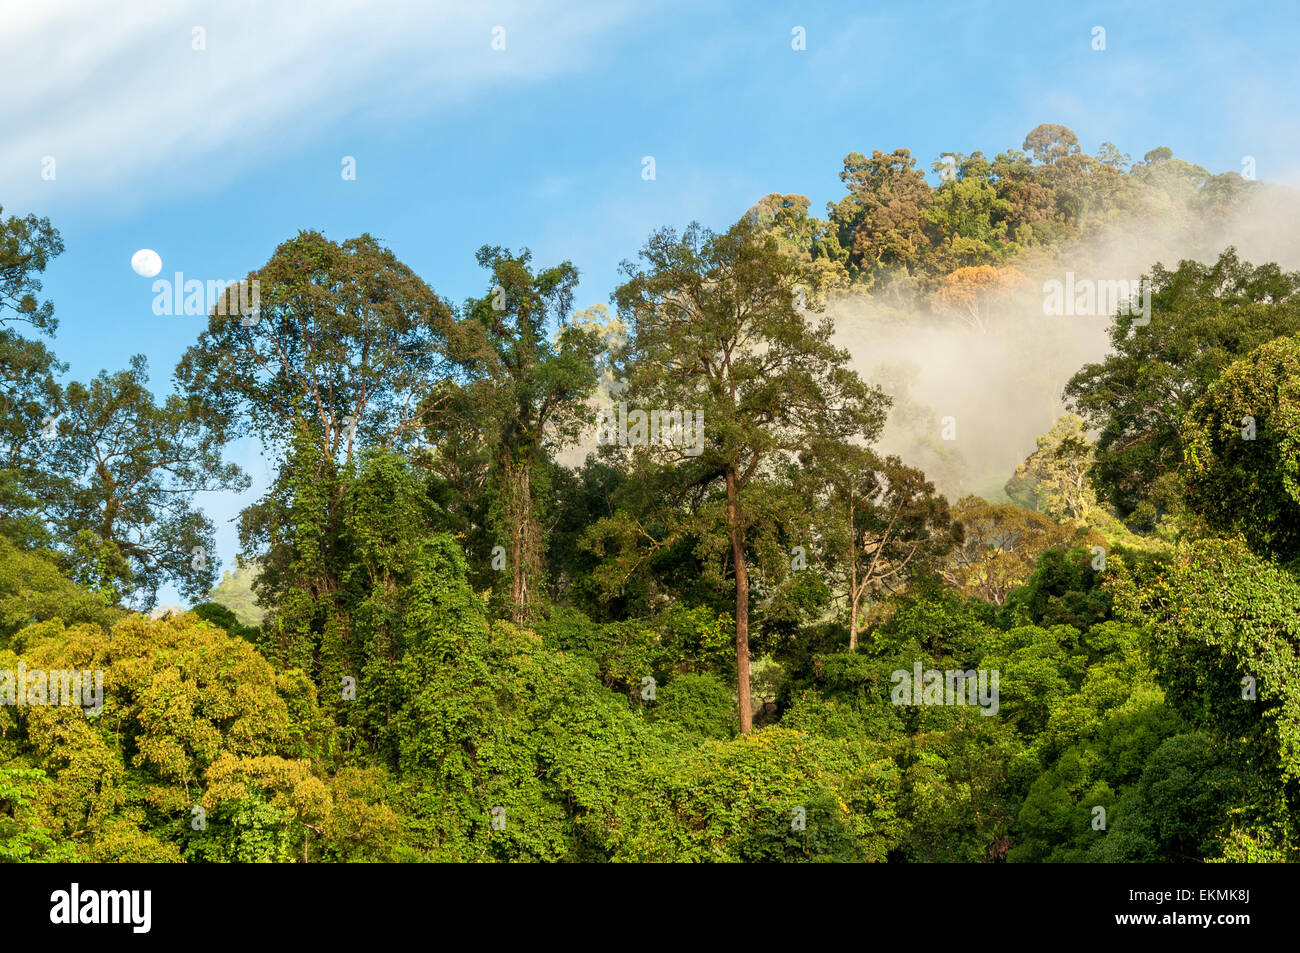 view-of-the-borneo-rainforest-trees-malaysia-EKMK8J.jpg